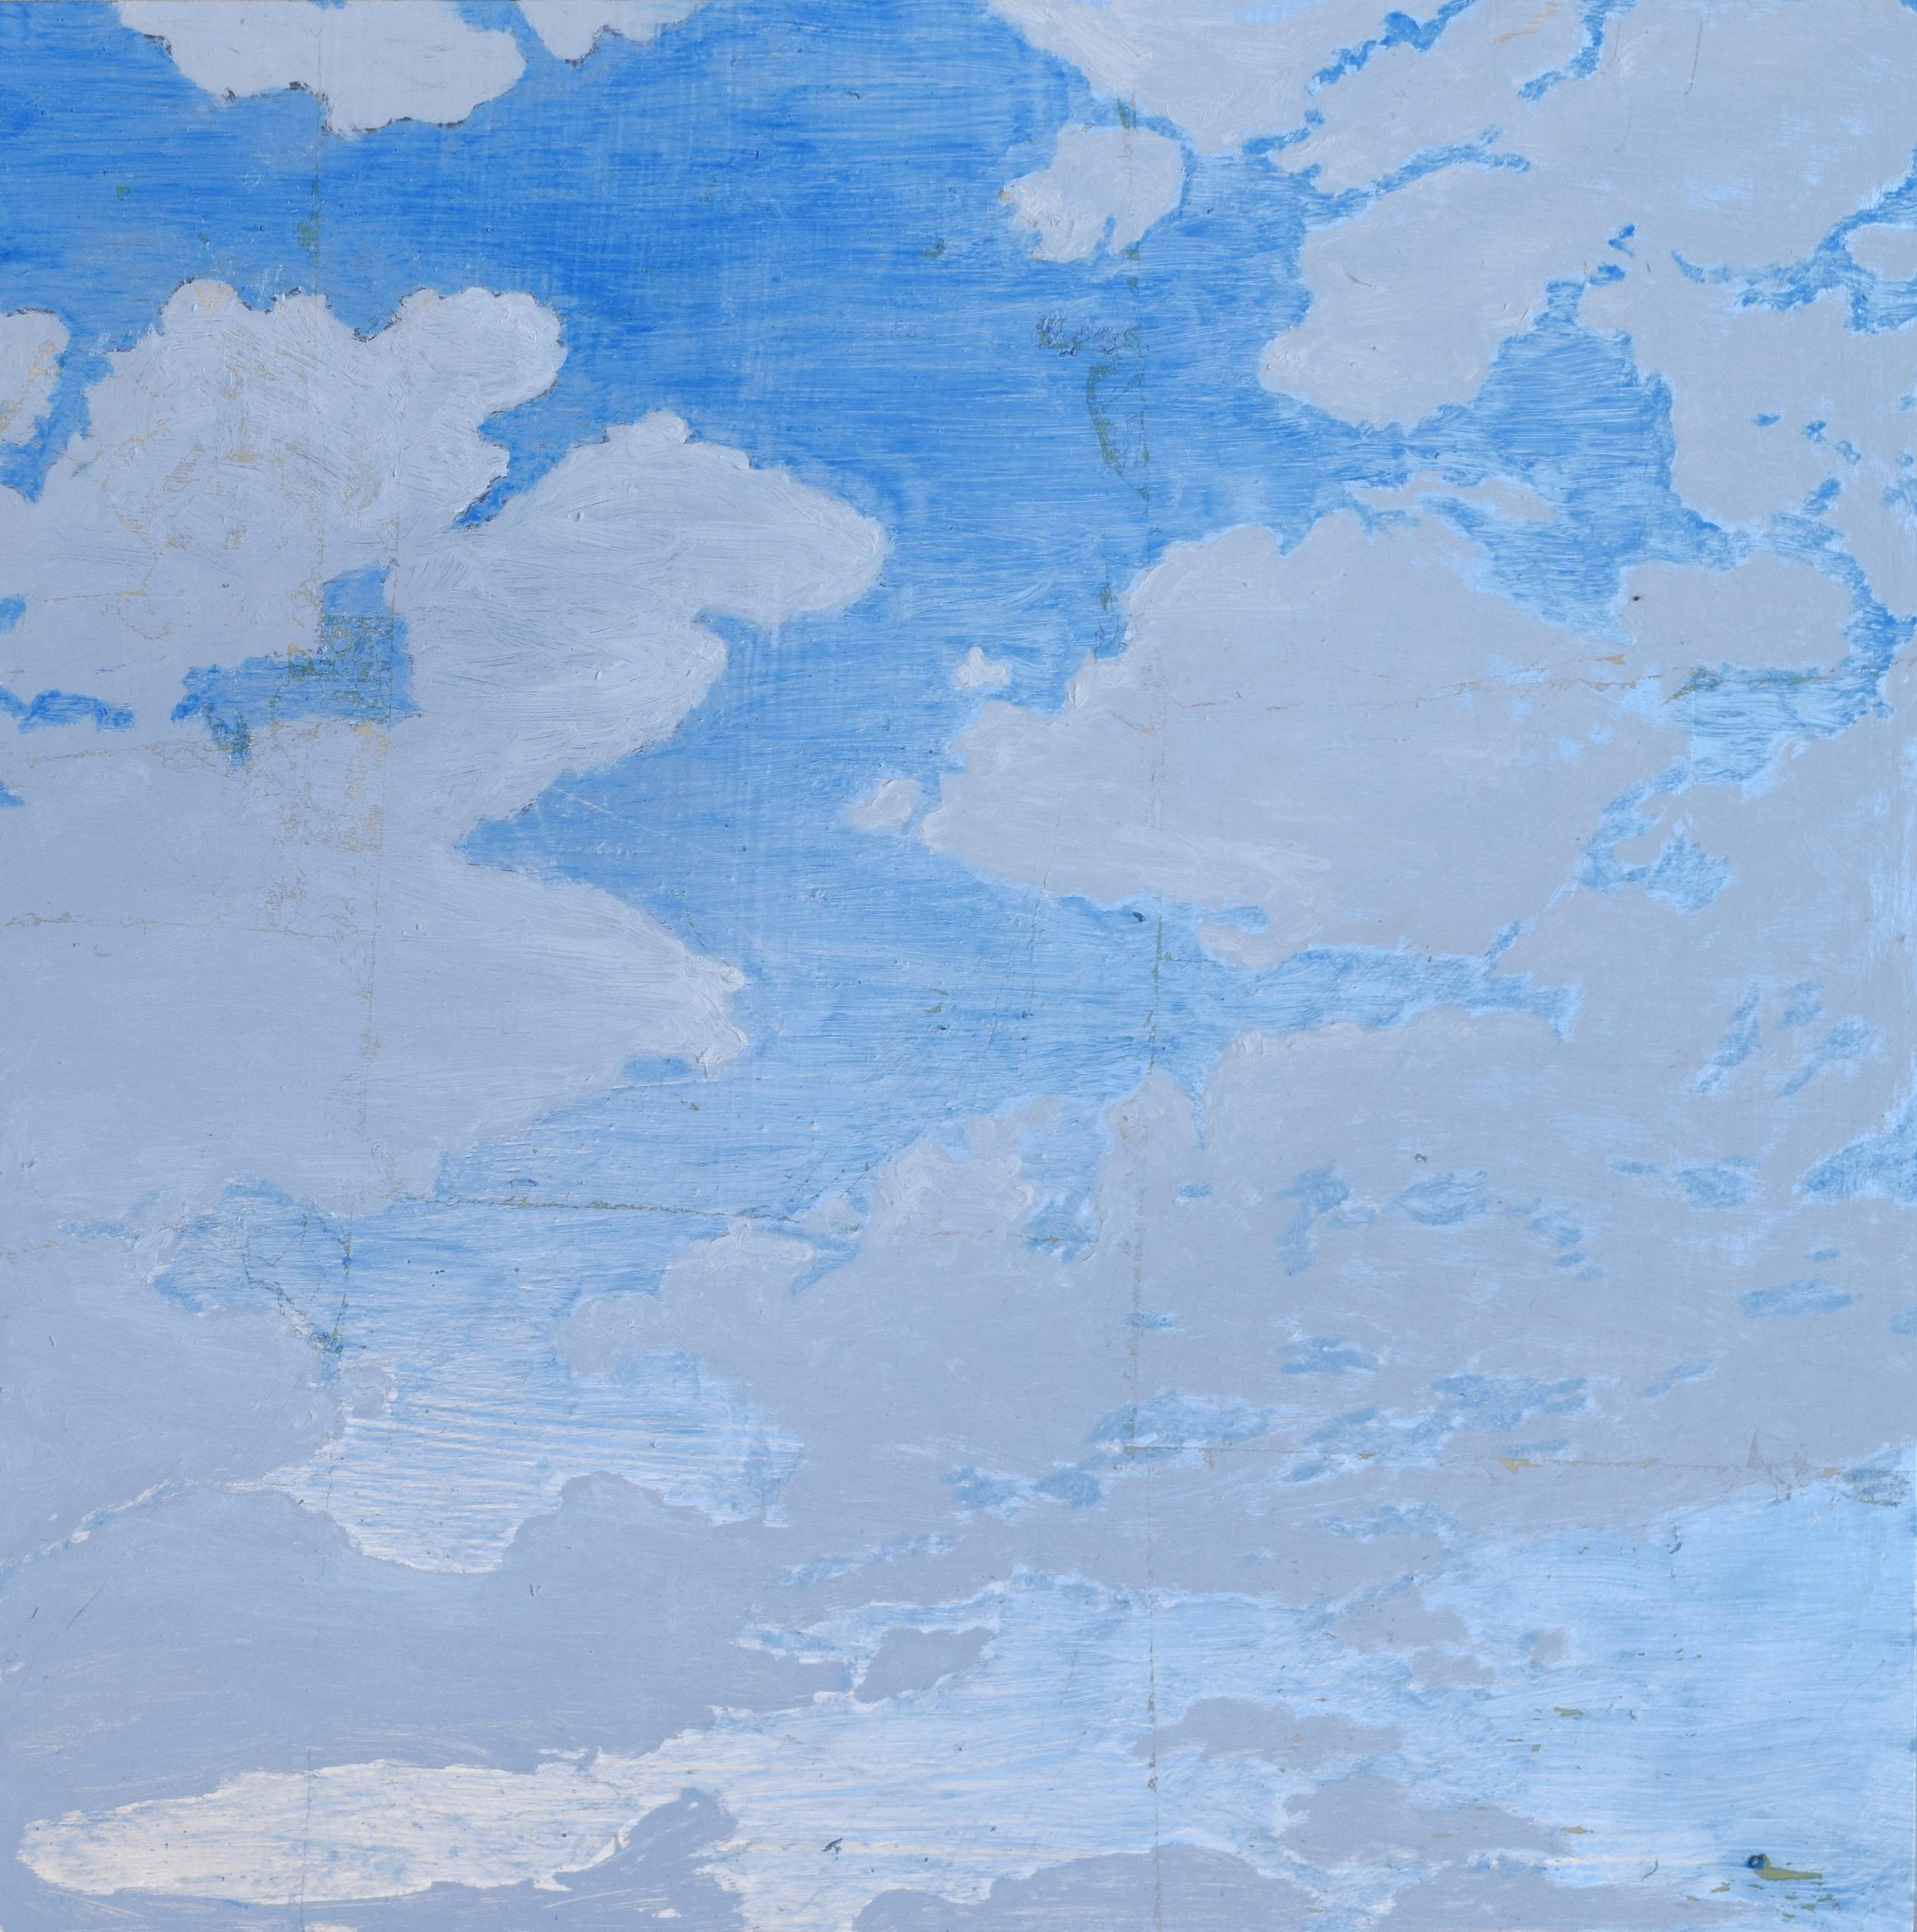 Cloud Study 9-2-15.jpg